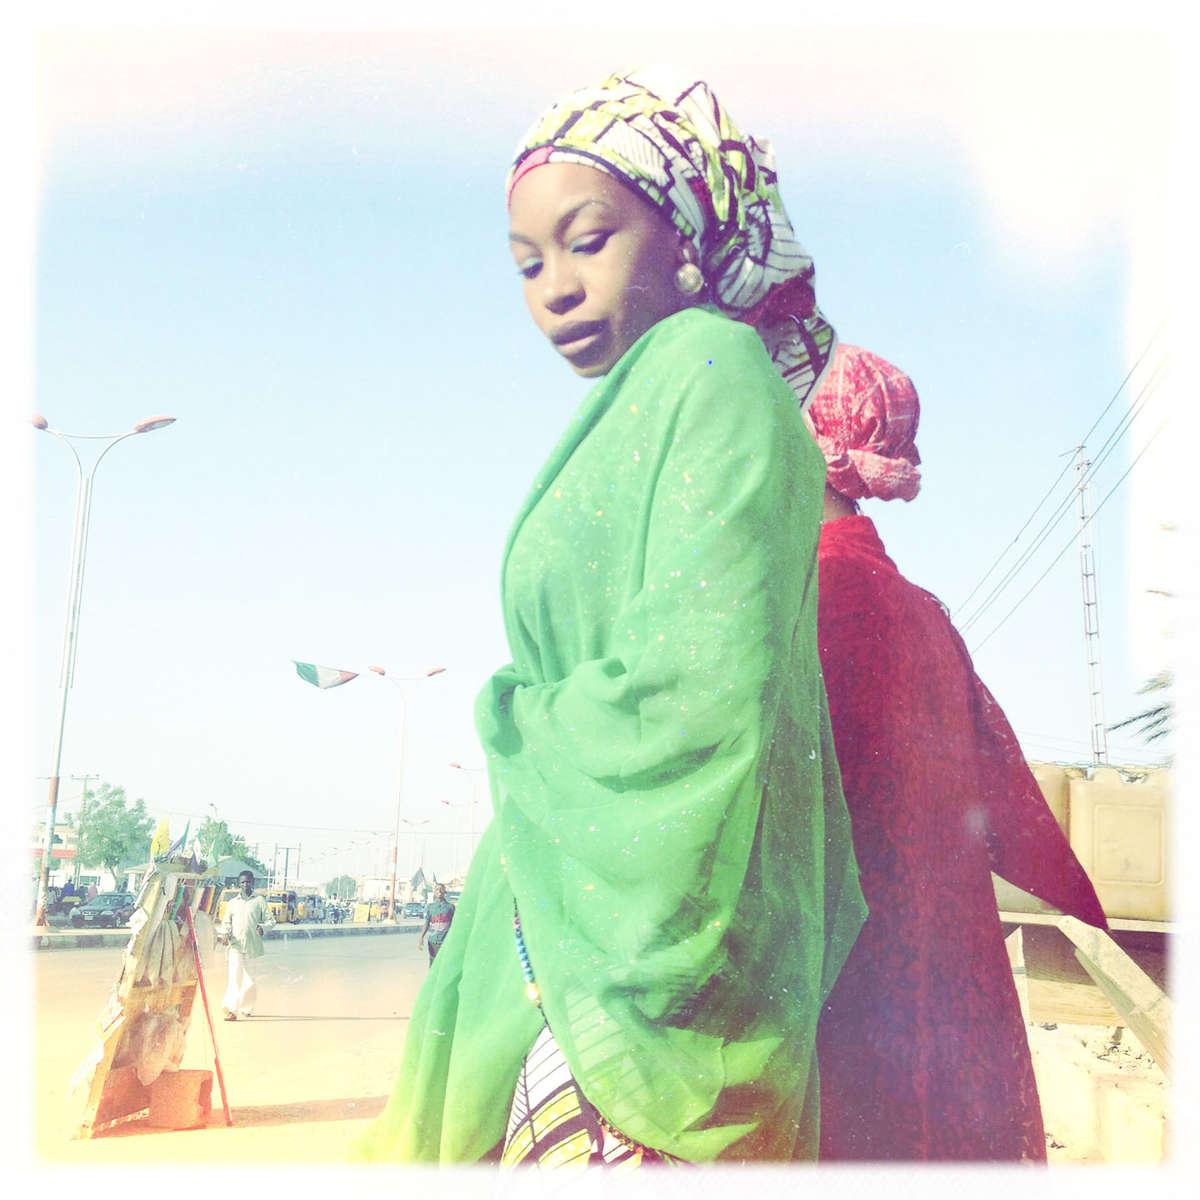 Pretty ladies in Kano, Northern Nigeria. April 2013.